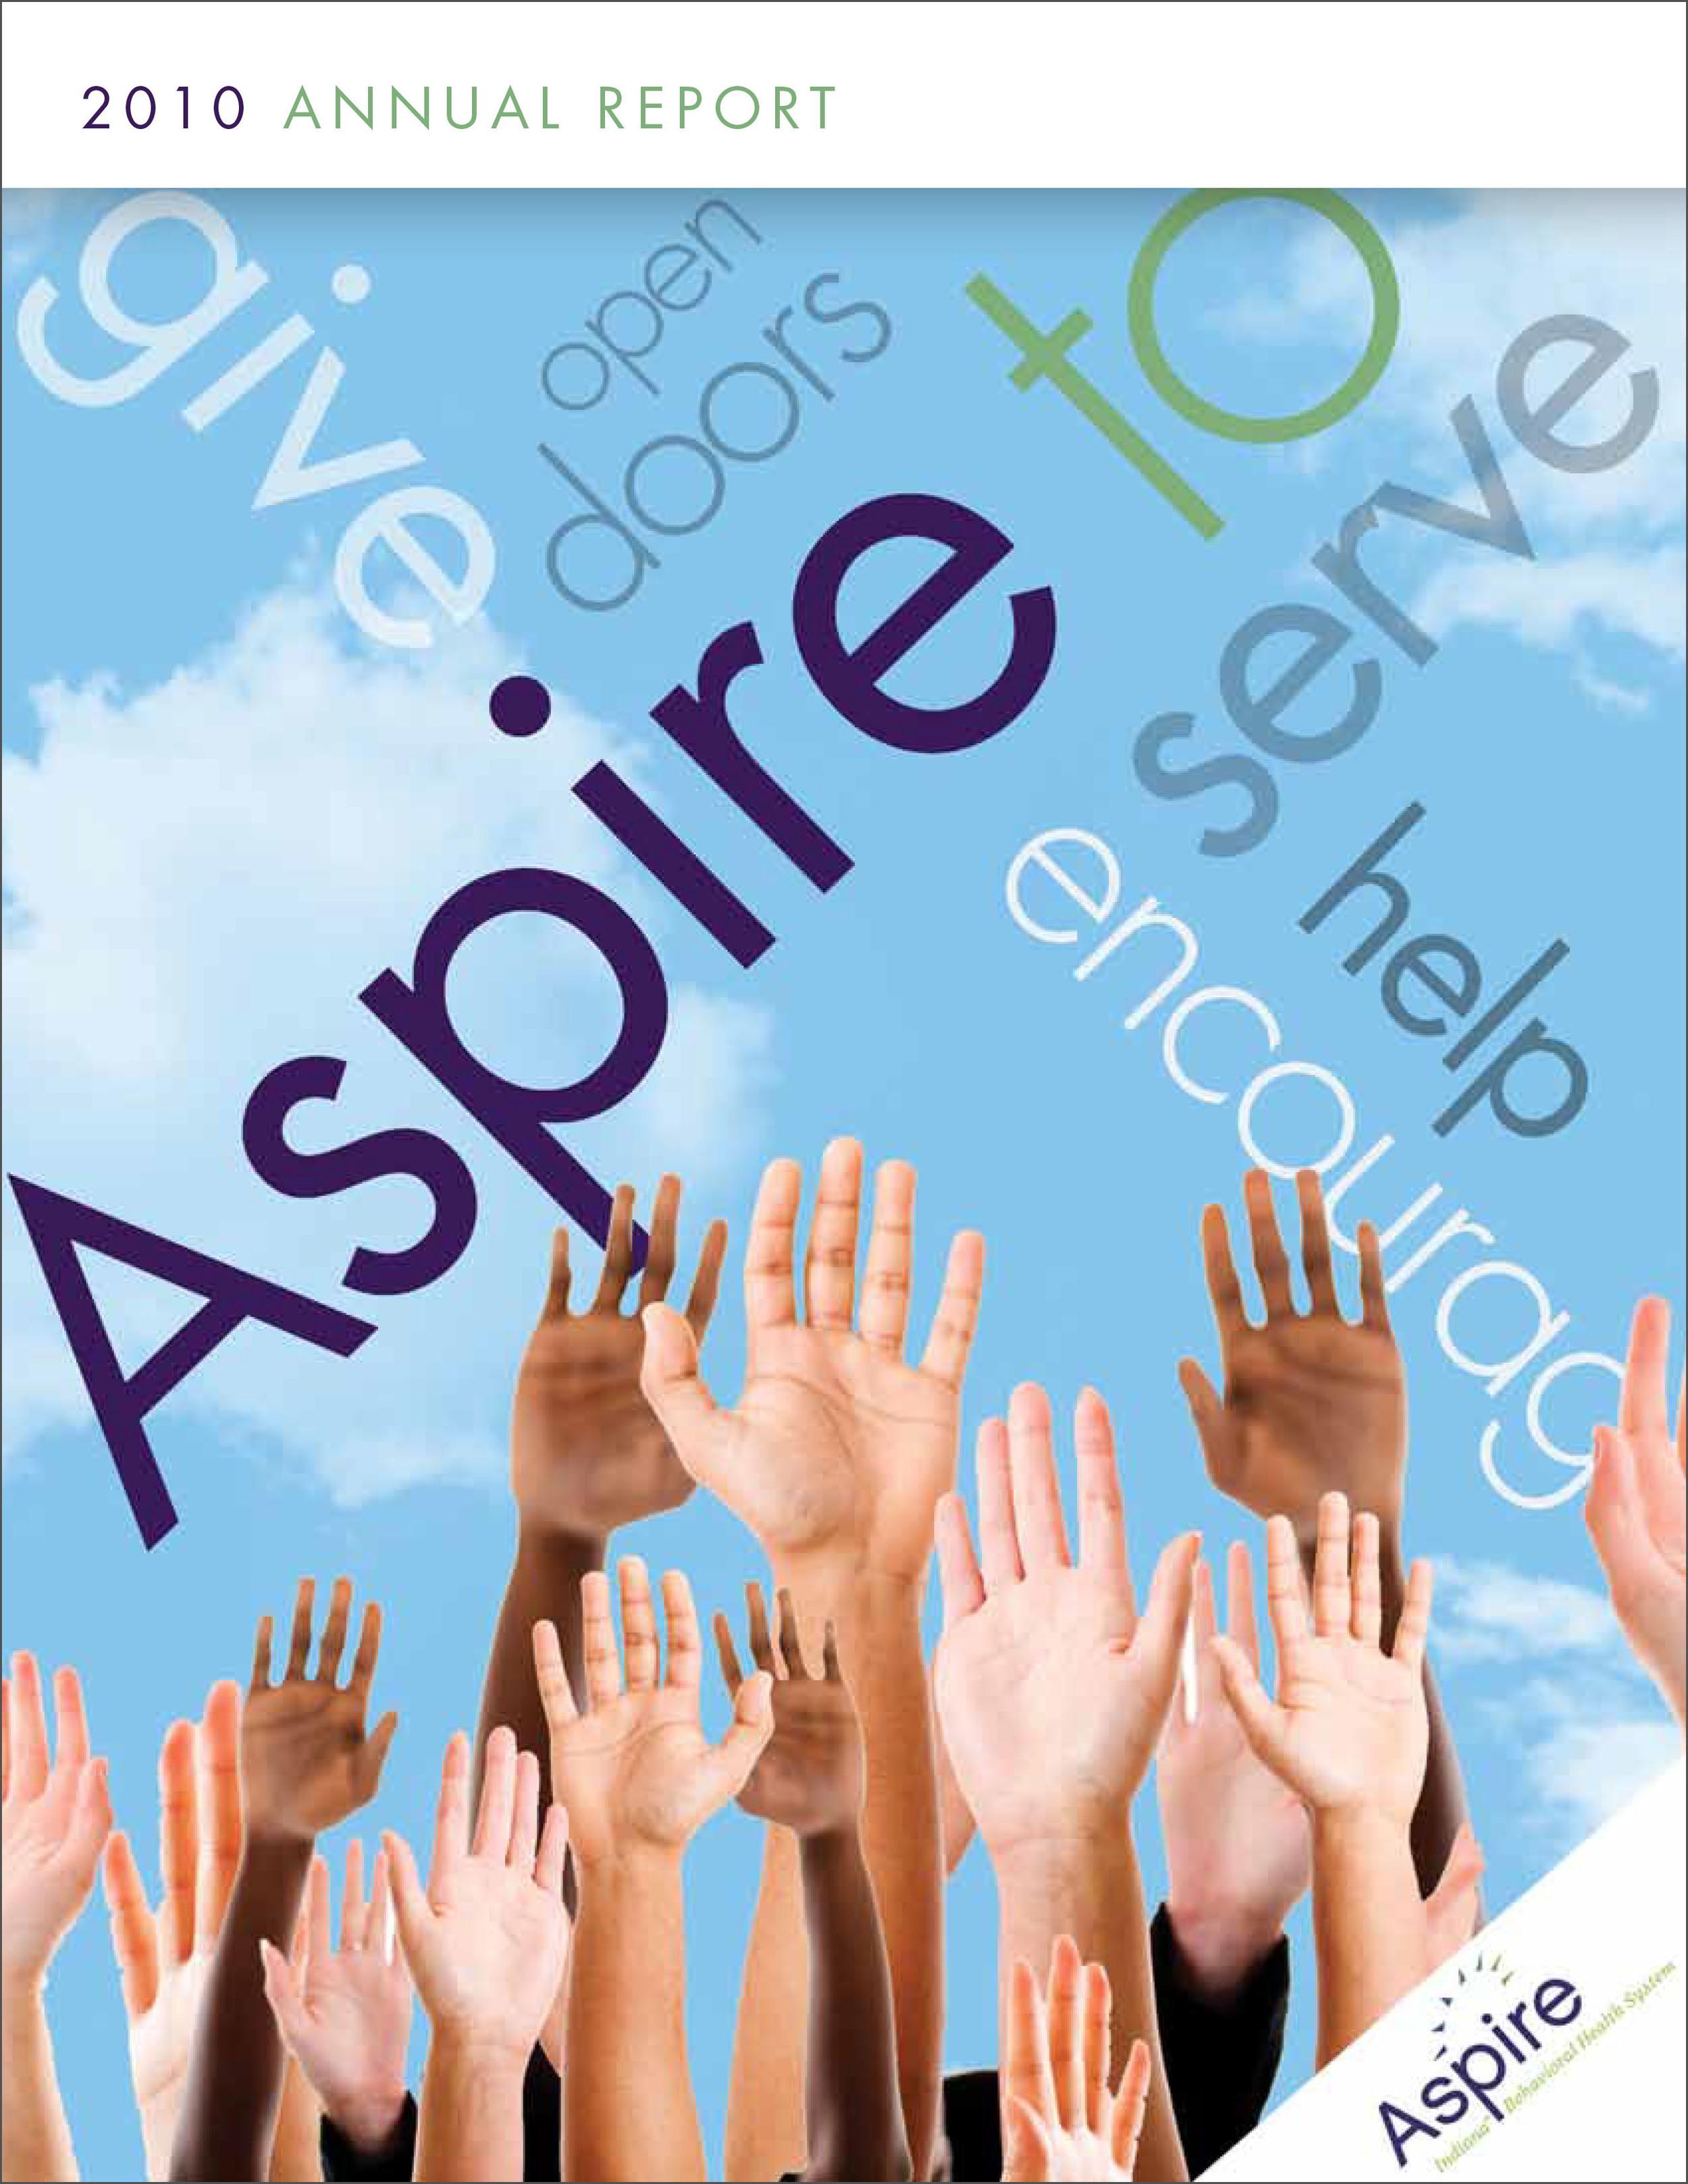 Aspire Indiana Annual Report 2010